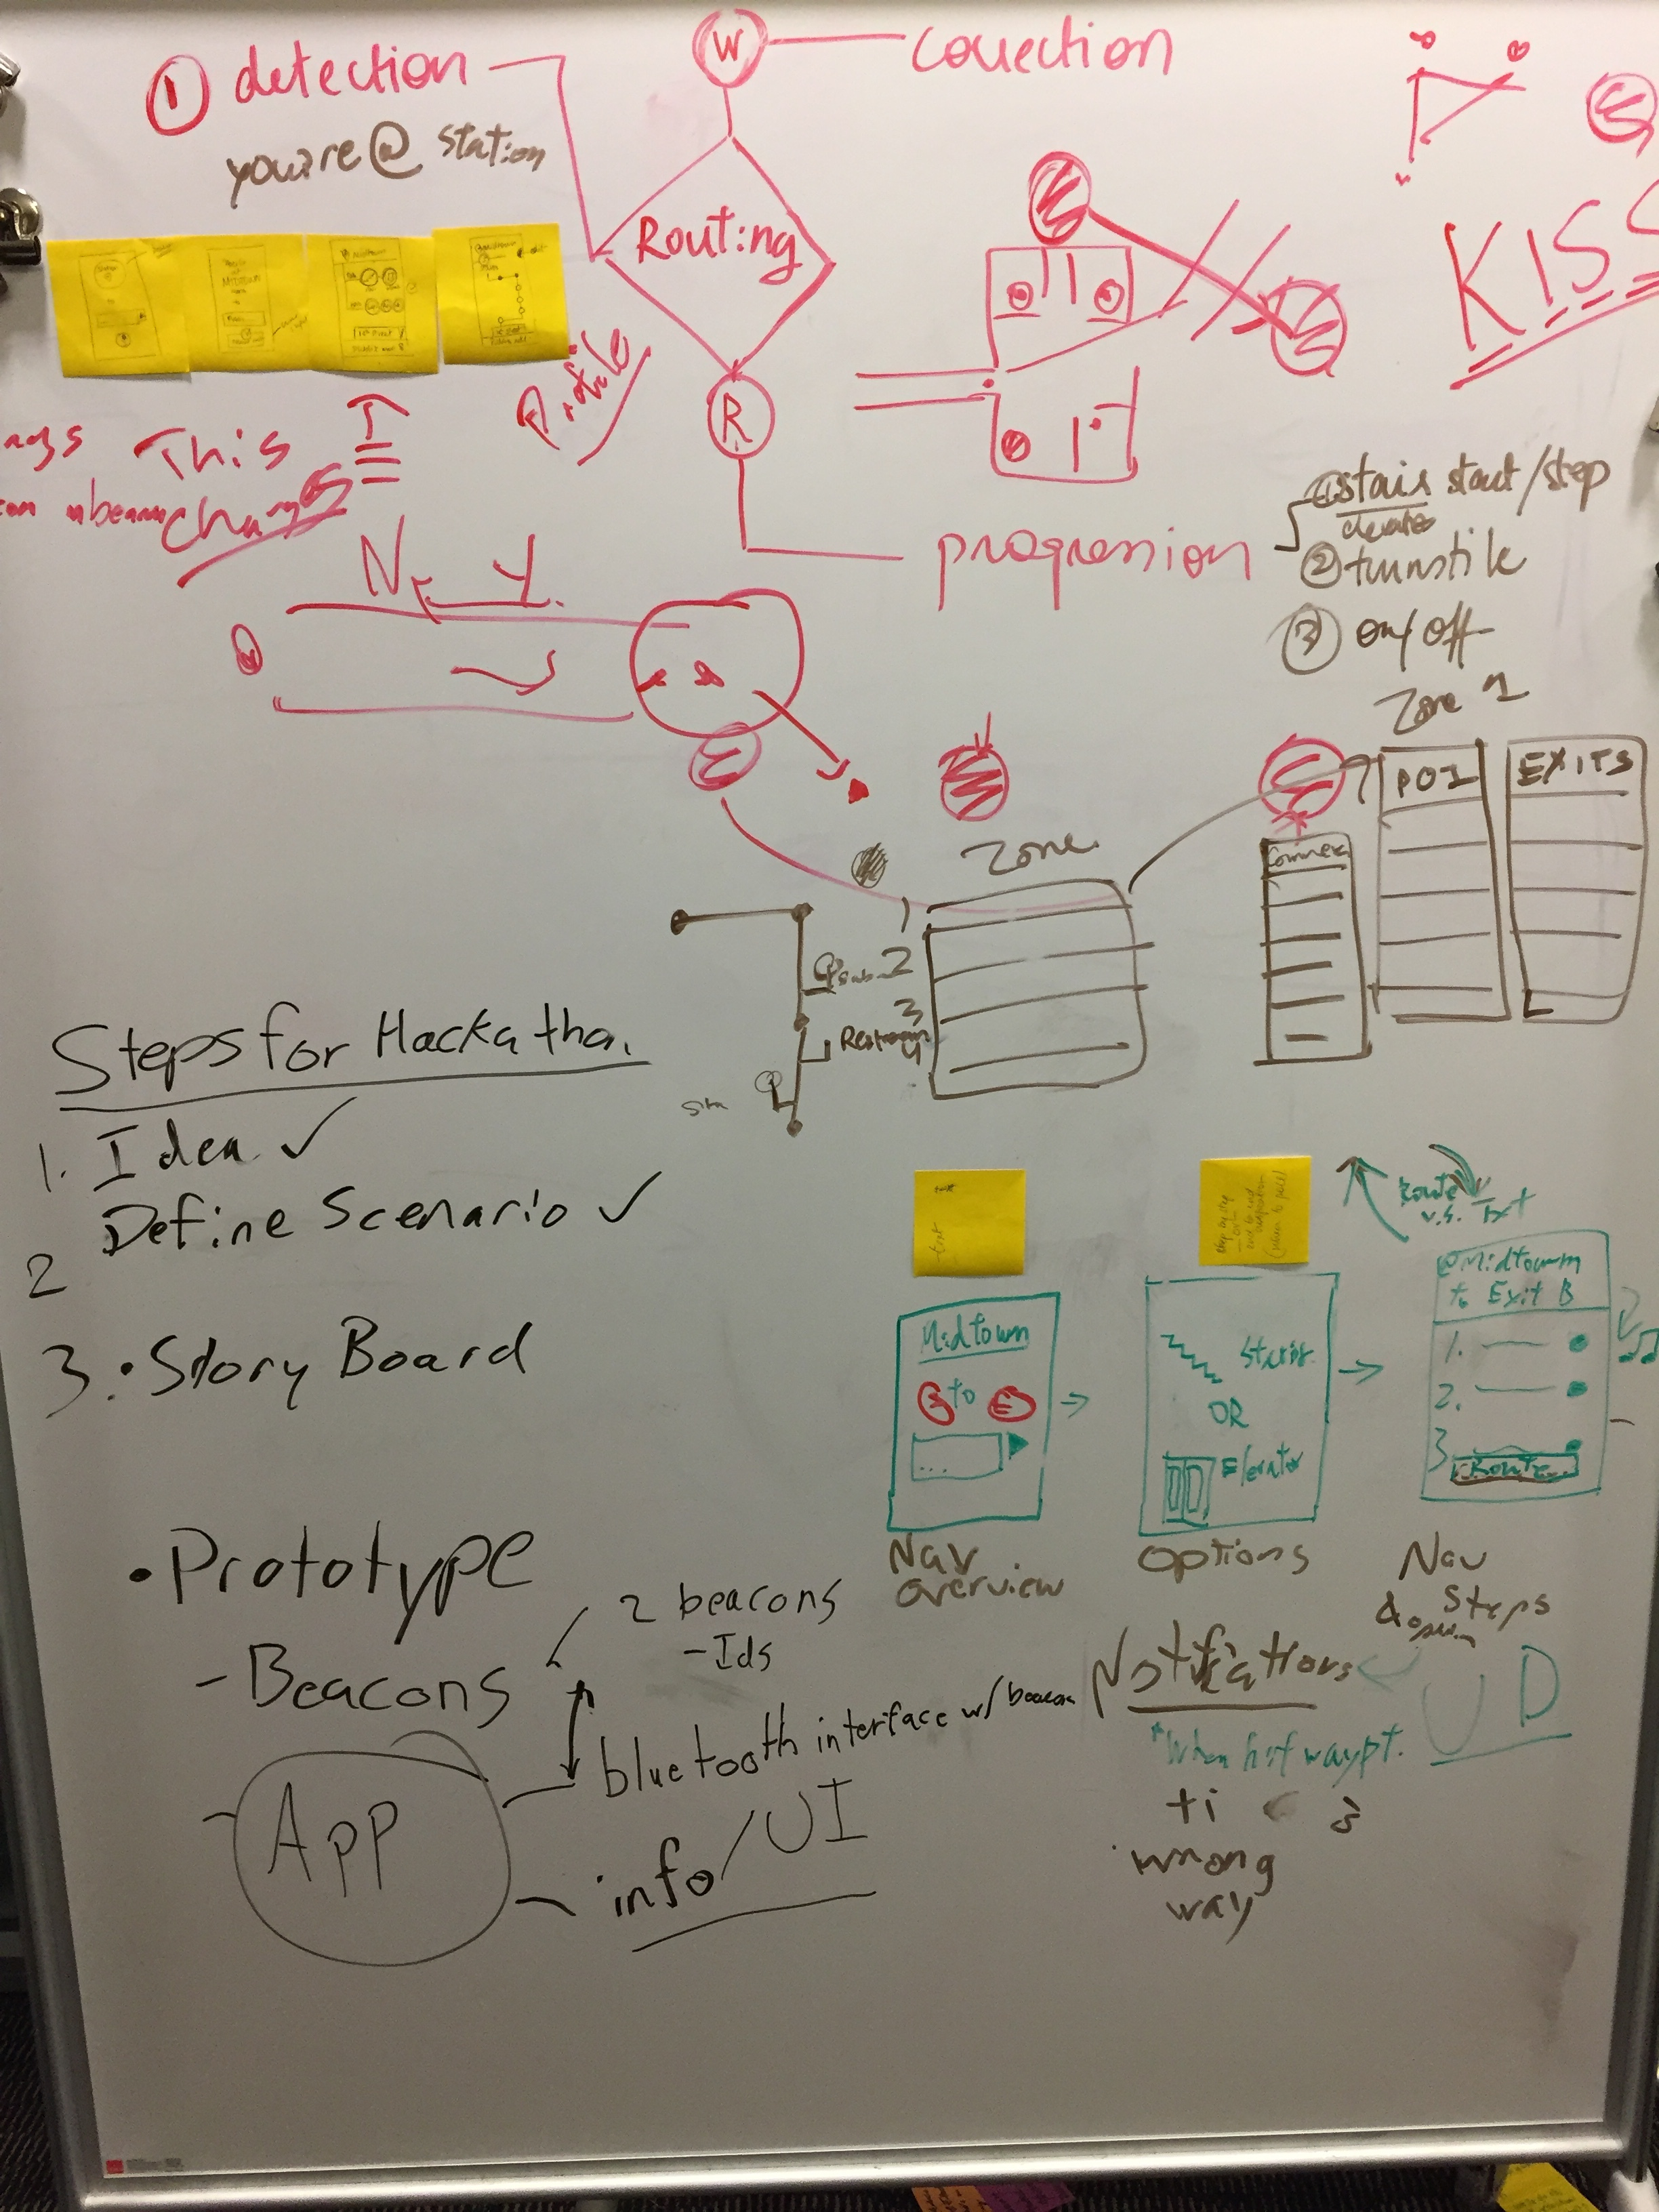 Designing user interaction